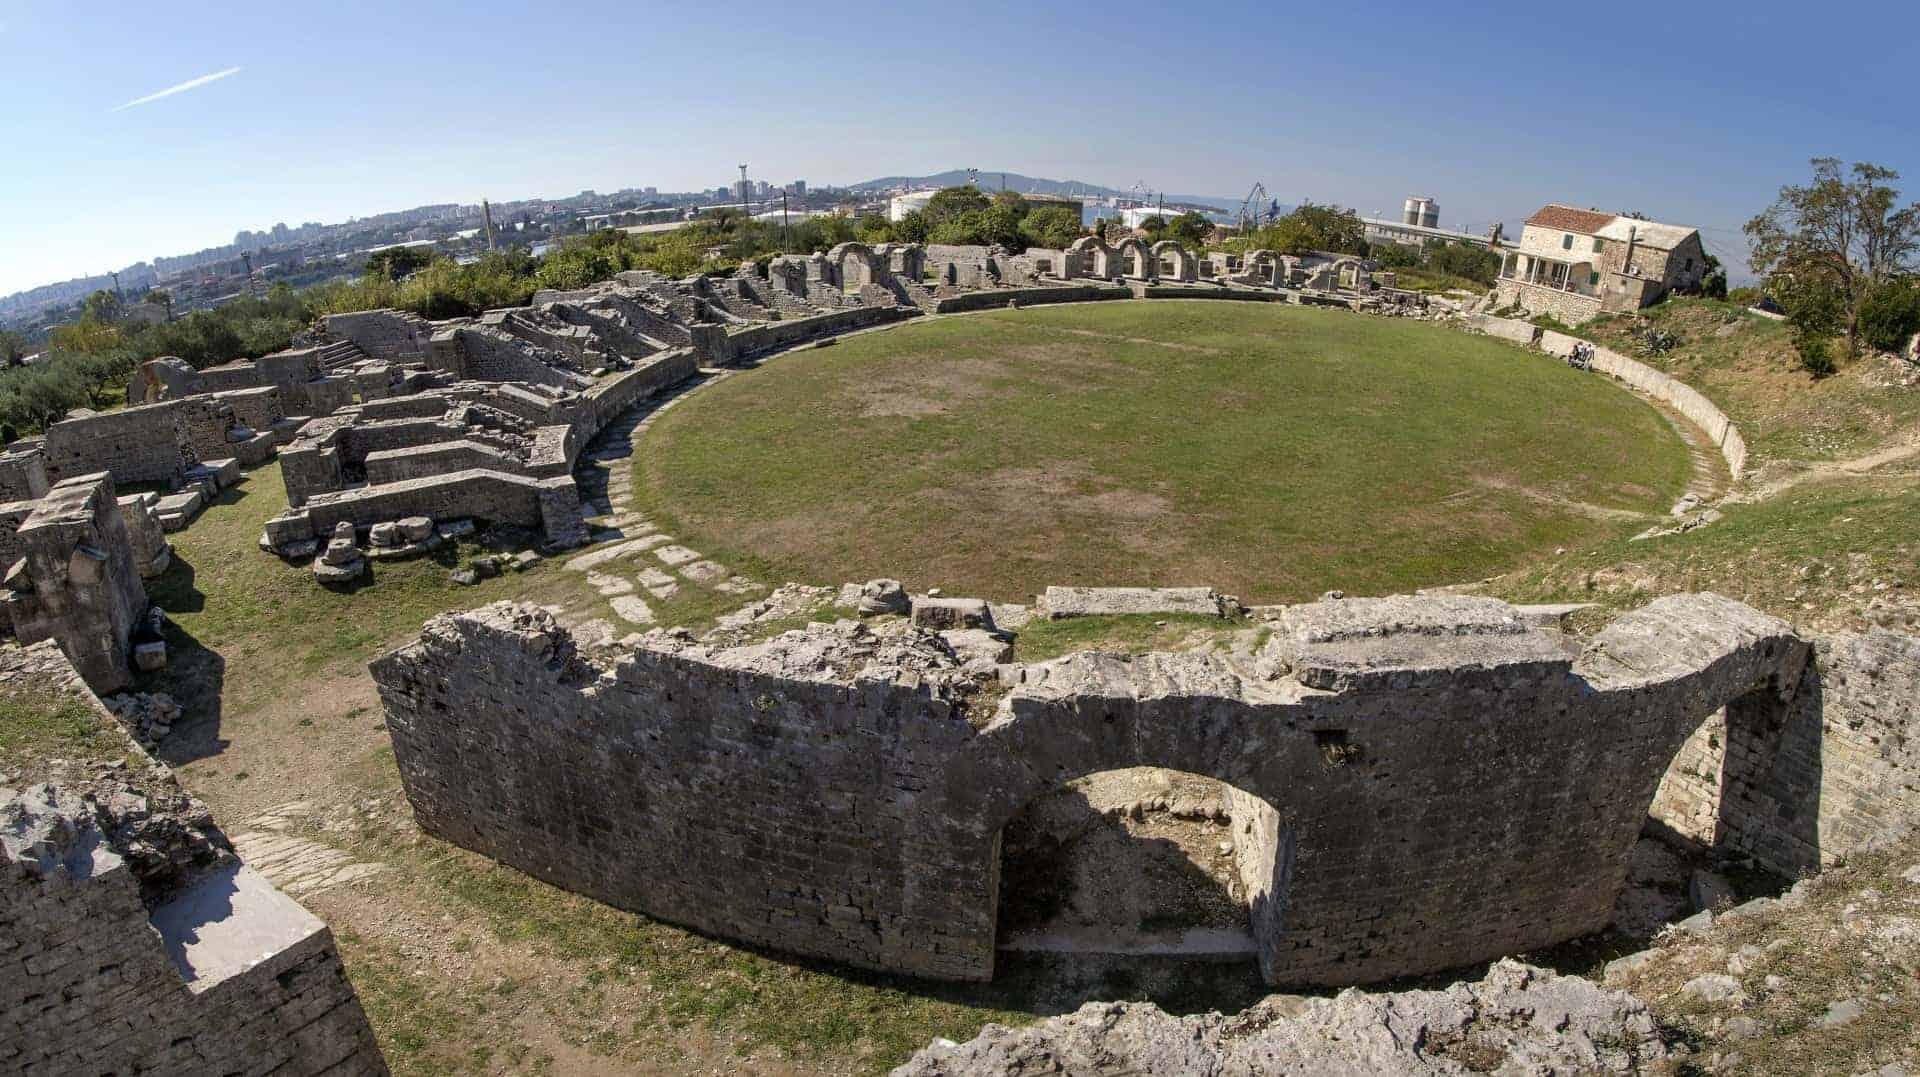 Roman Ruins near the town of Split, Croatia